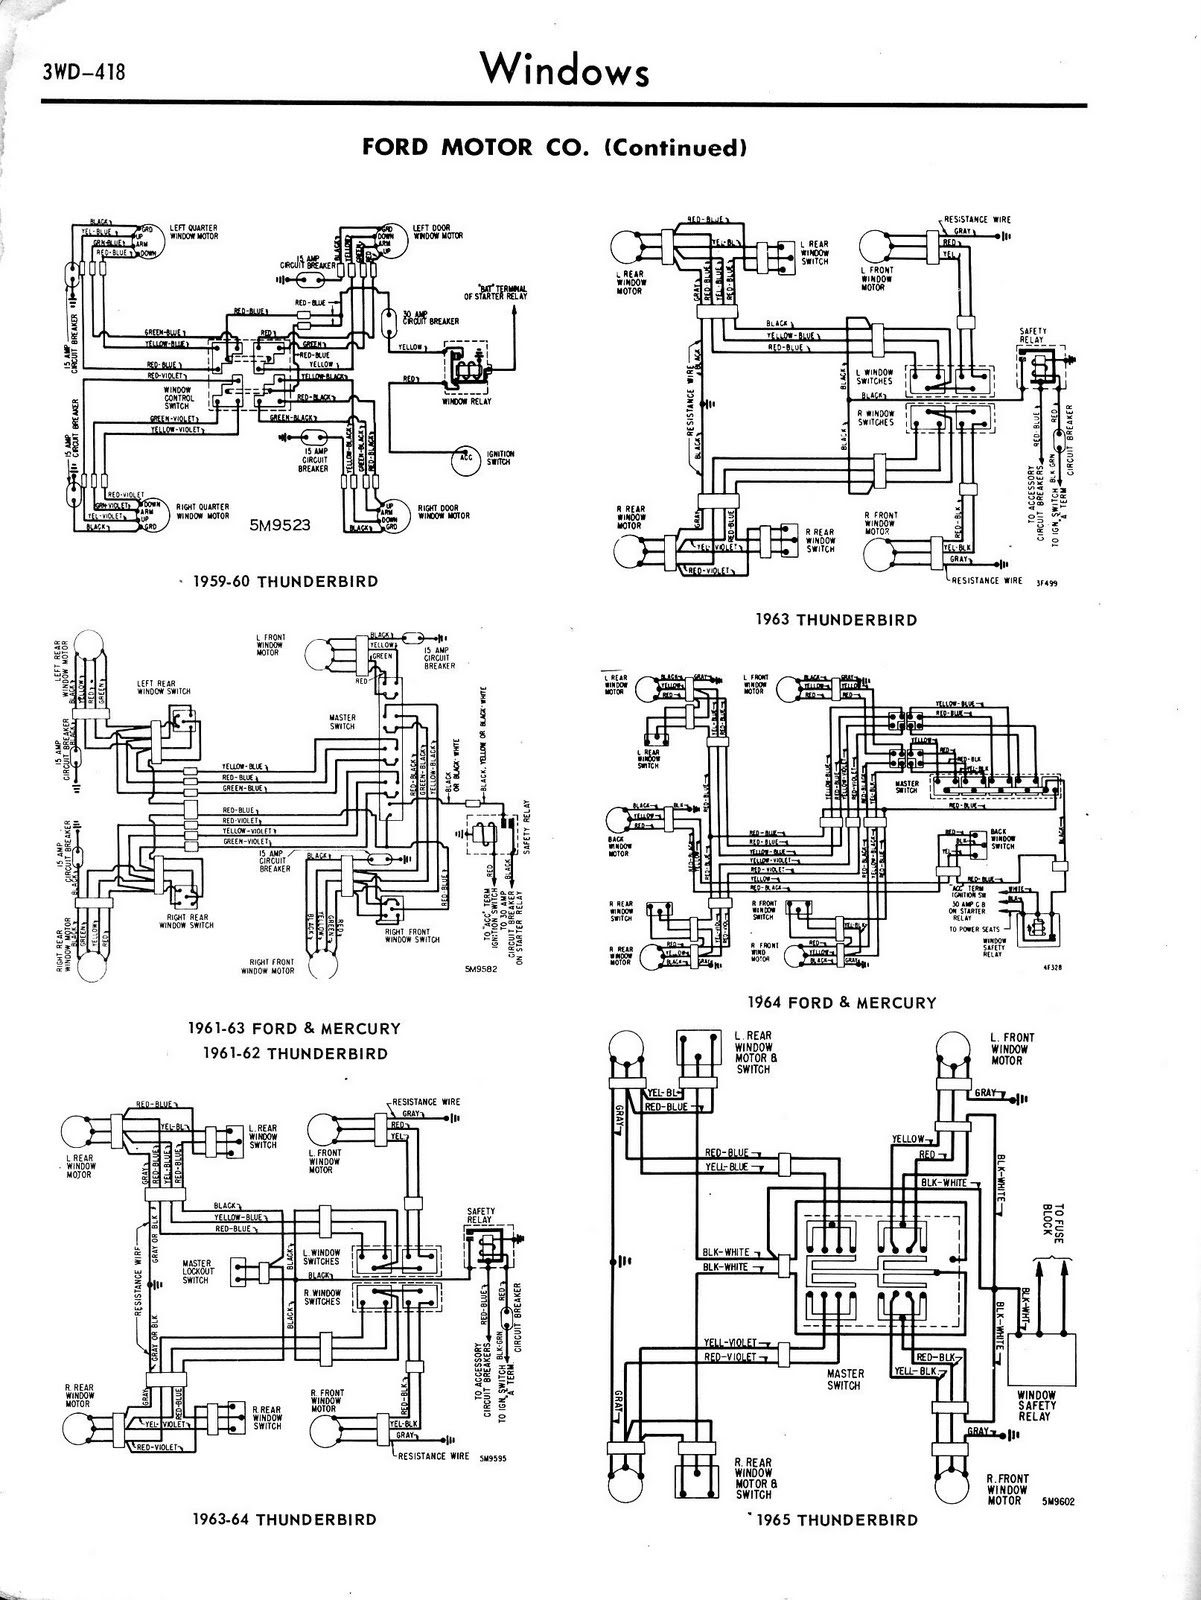 1989 Ford Thunderbird Wiring Diagram Archive Of Automotive F800 88 Fuse Box Electrical Diagrams Schematics Rh Glenifferagility Co Uk 1988 Radio